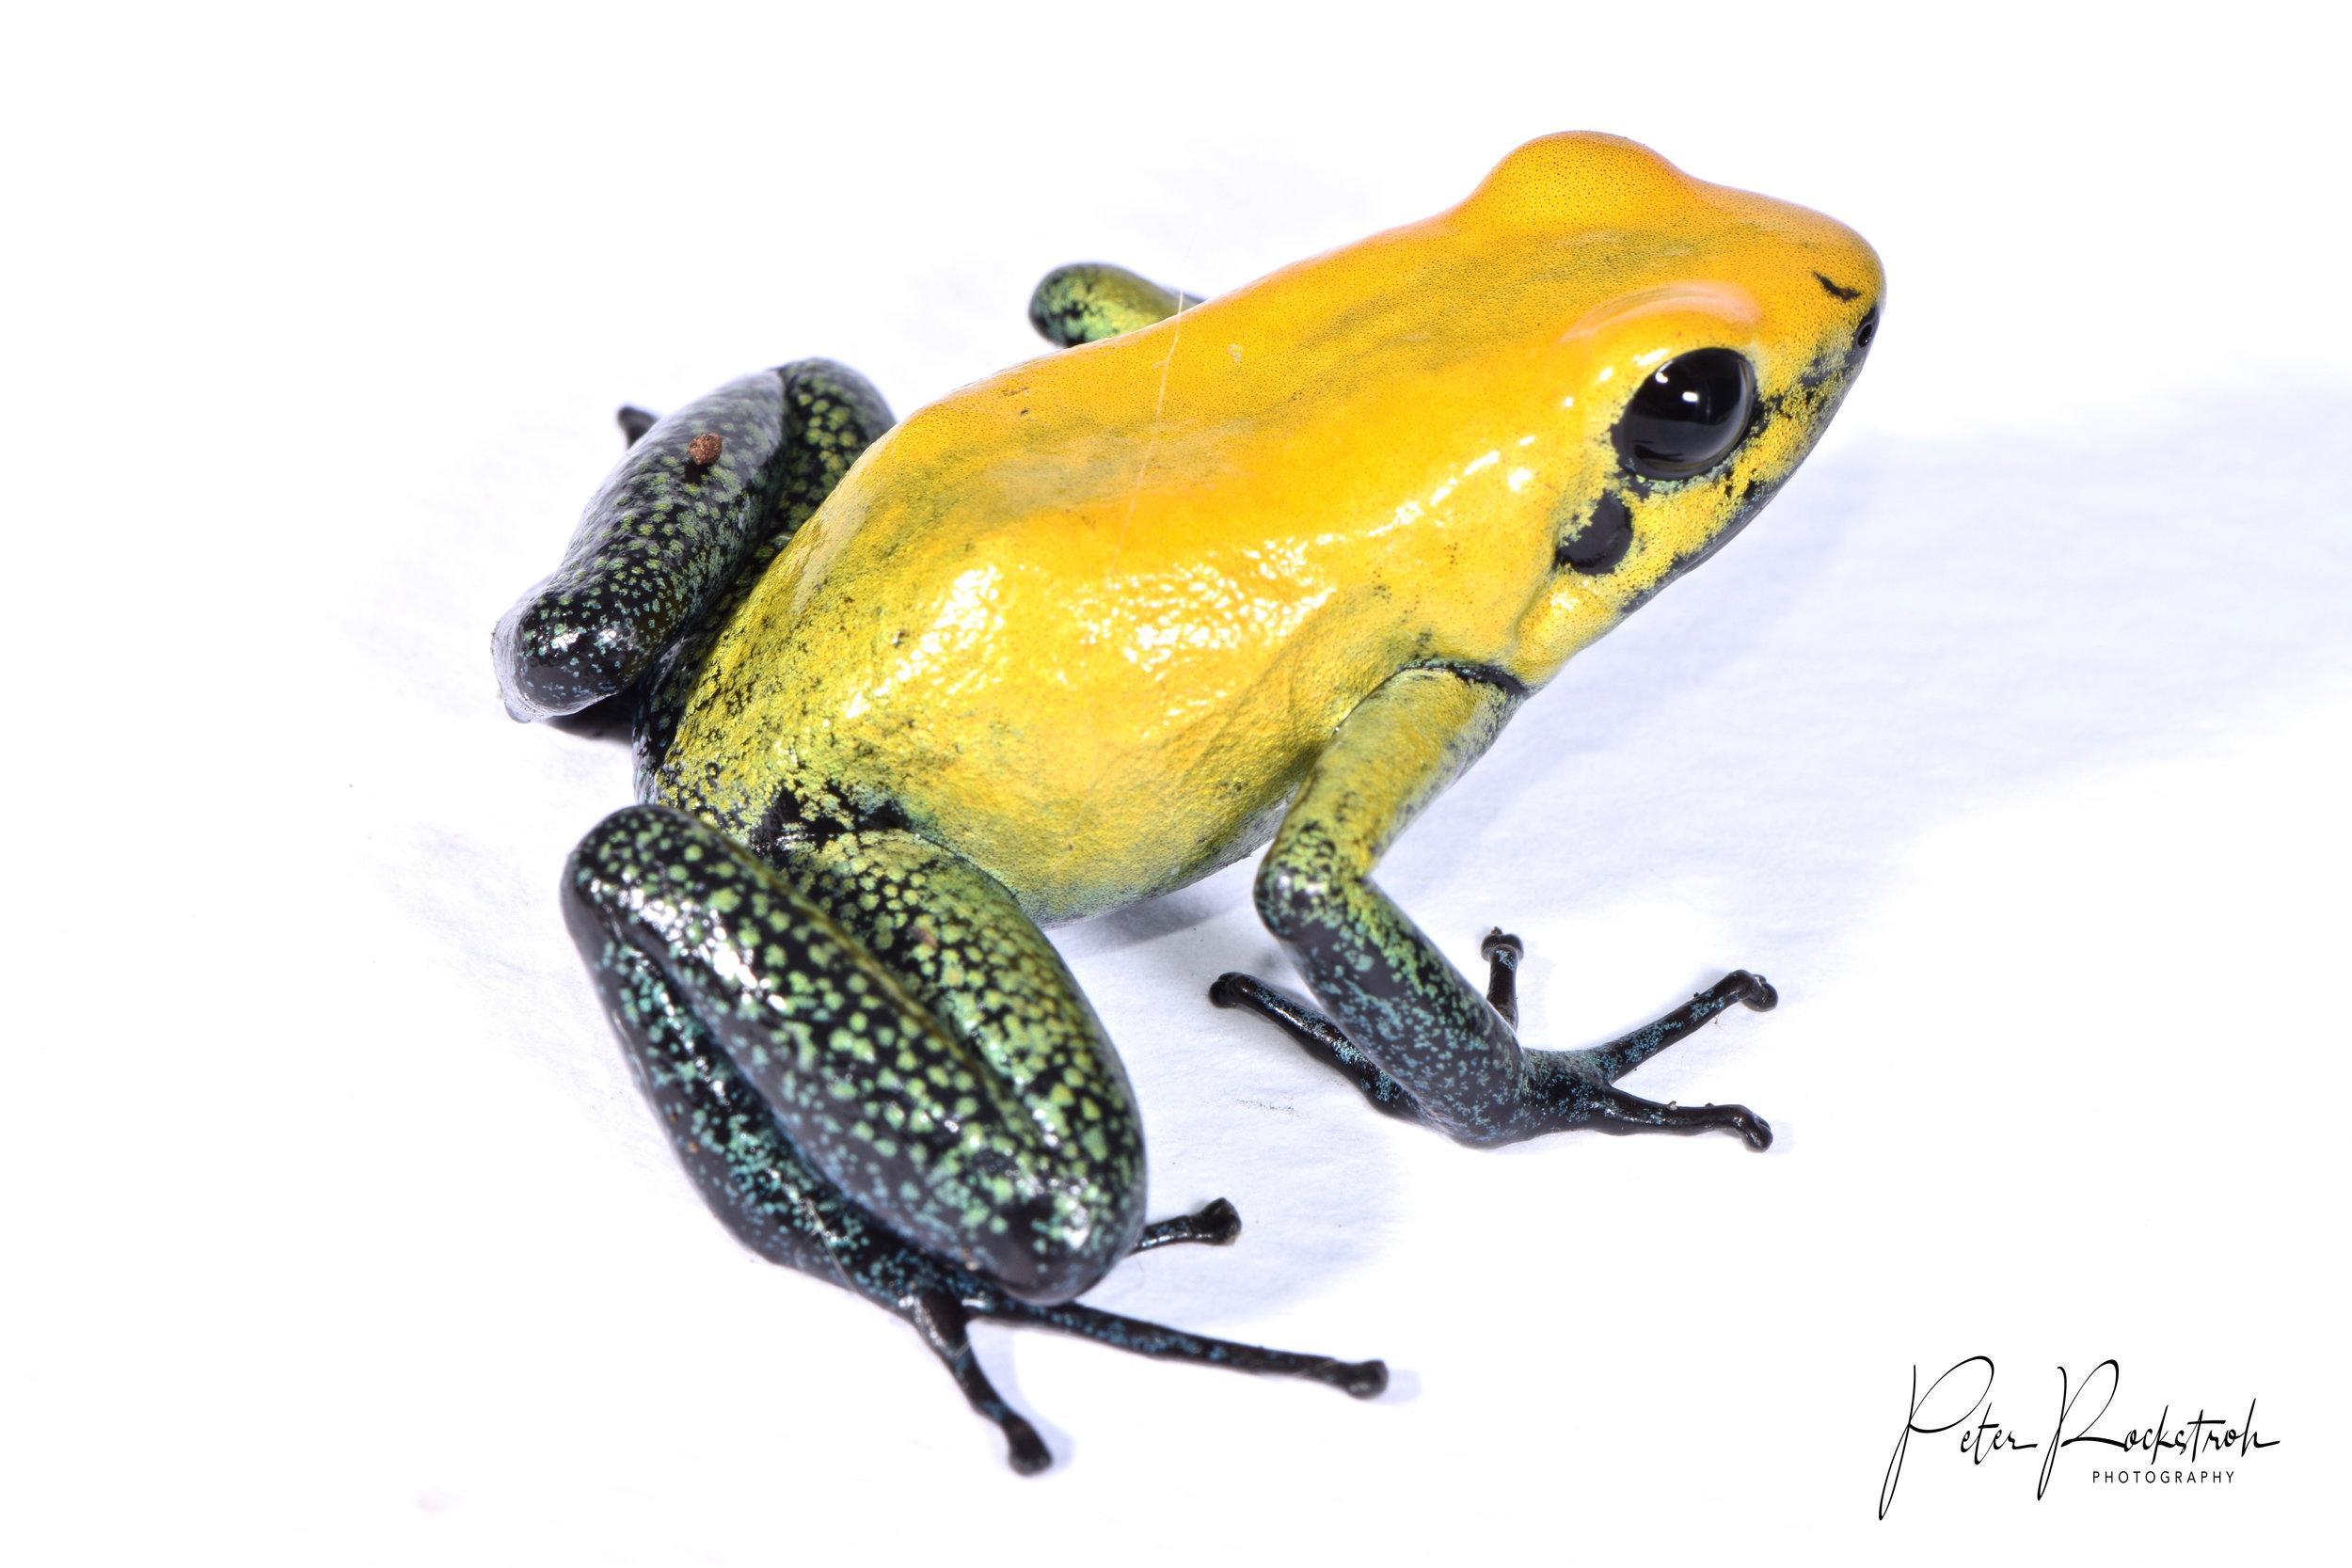 Phyllobates bicolor , yellow morph